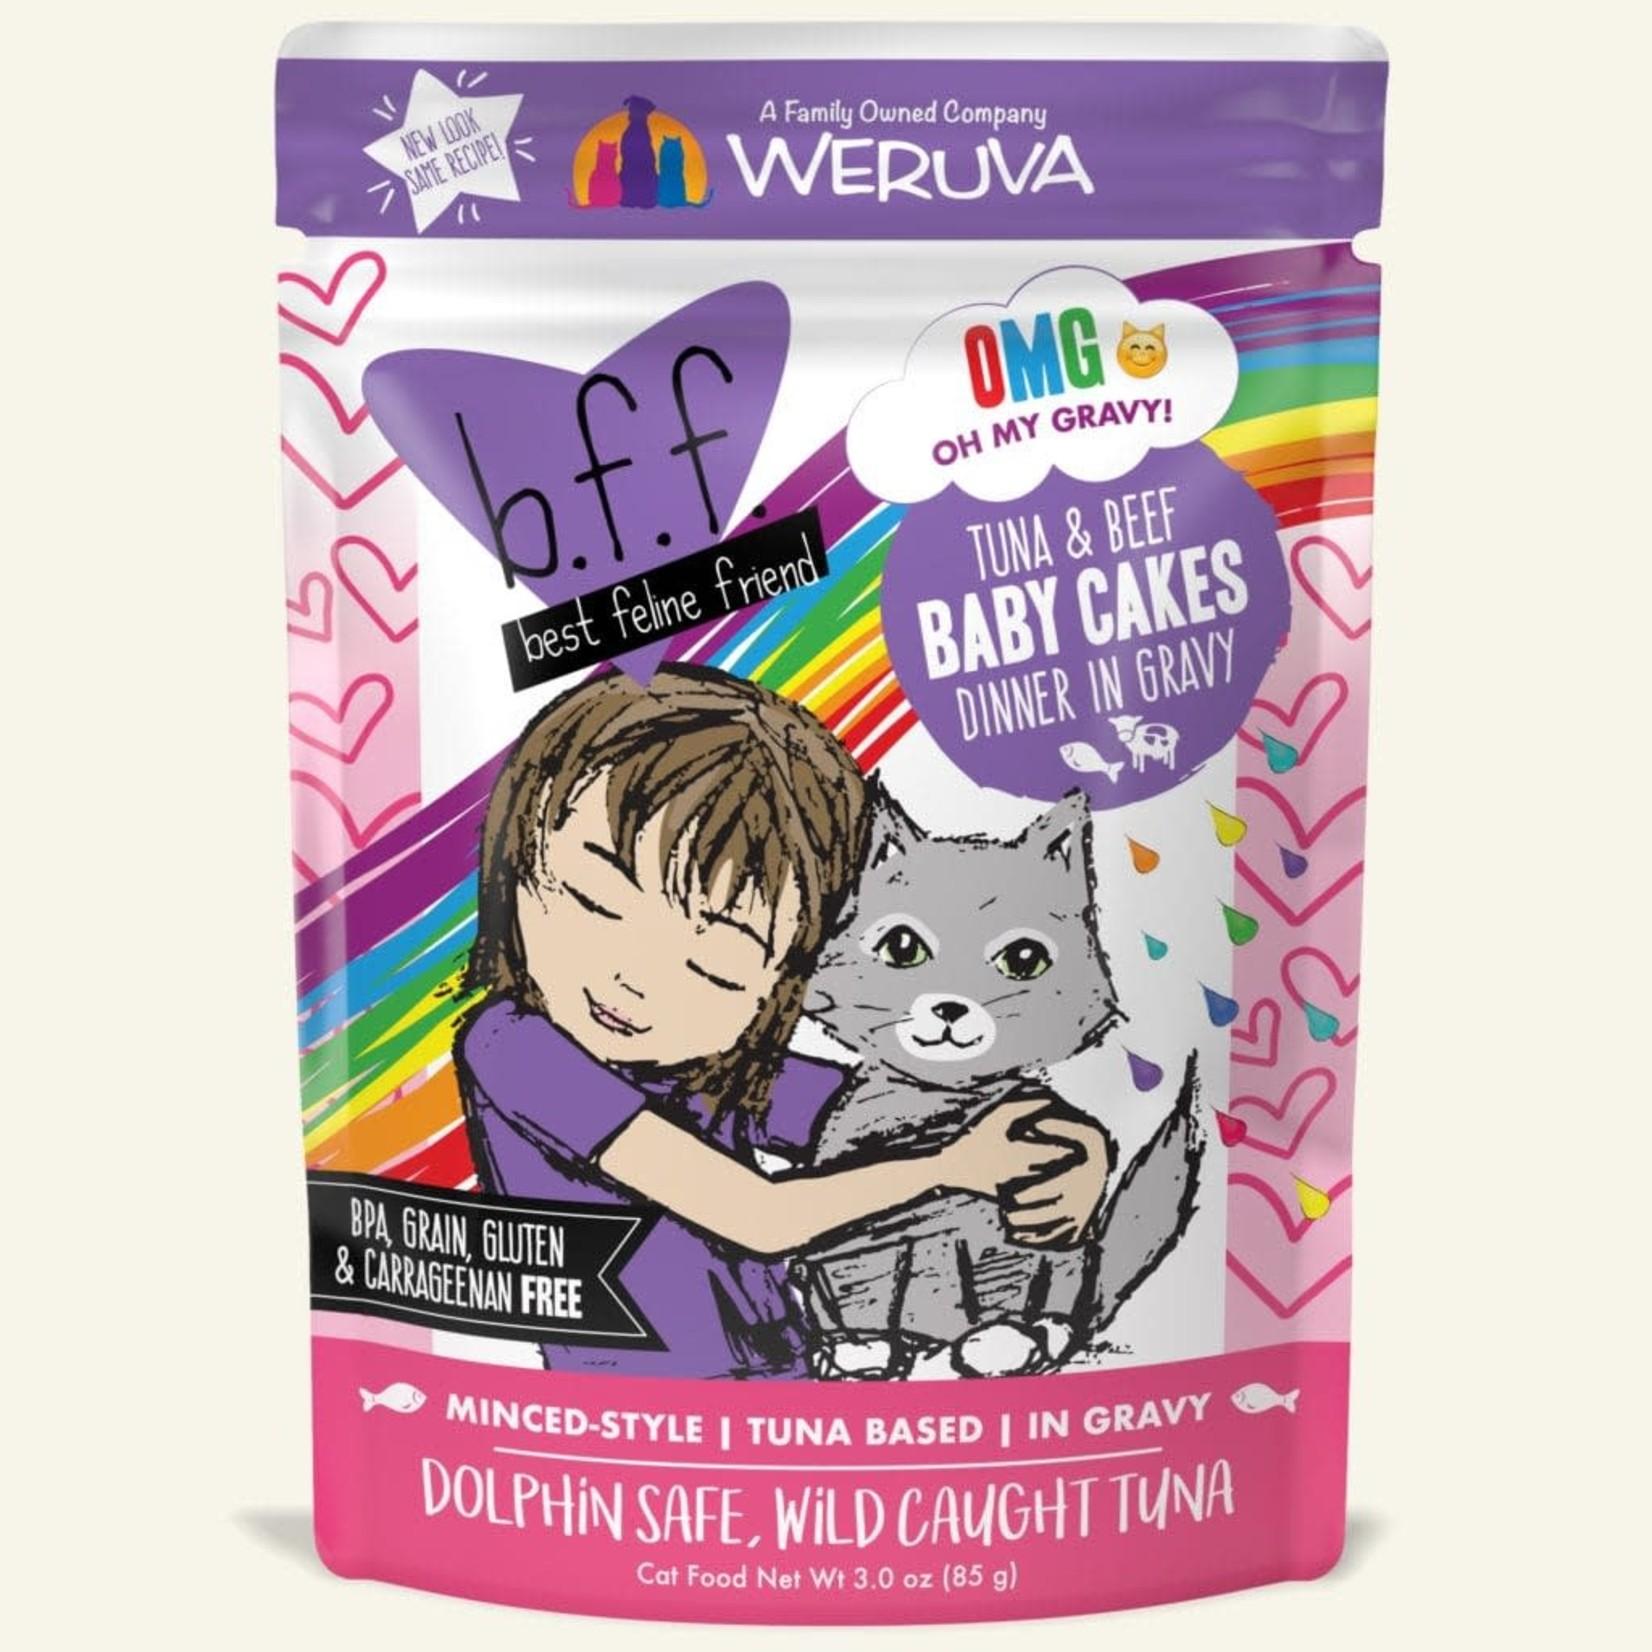 Weruva BFF OMG Cat Tuna & Beef Baby Cakes 3 OZ Pouch